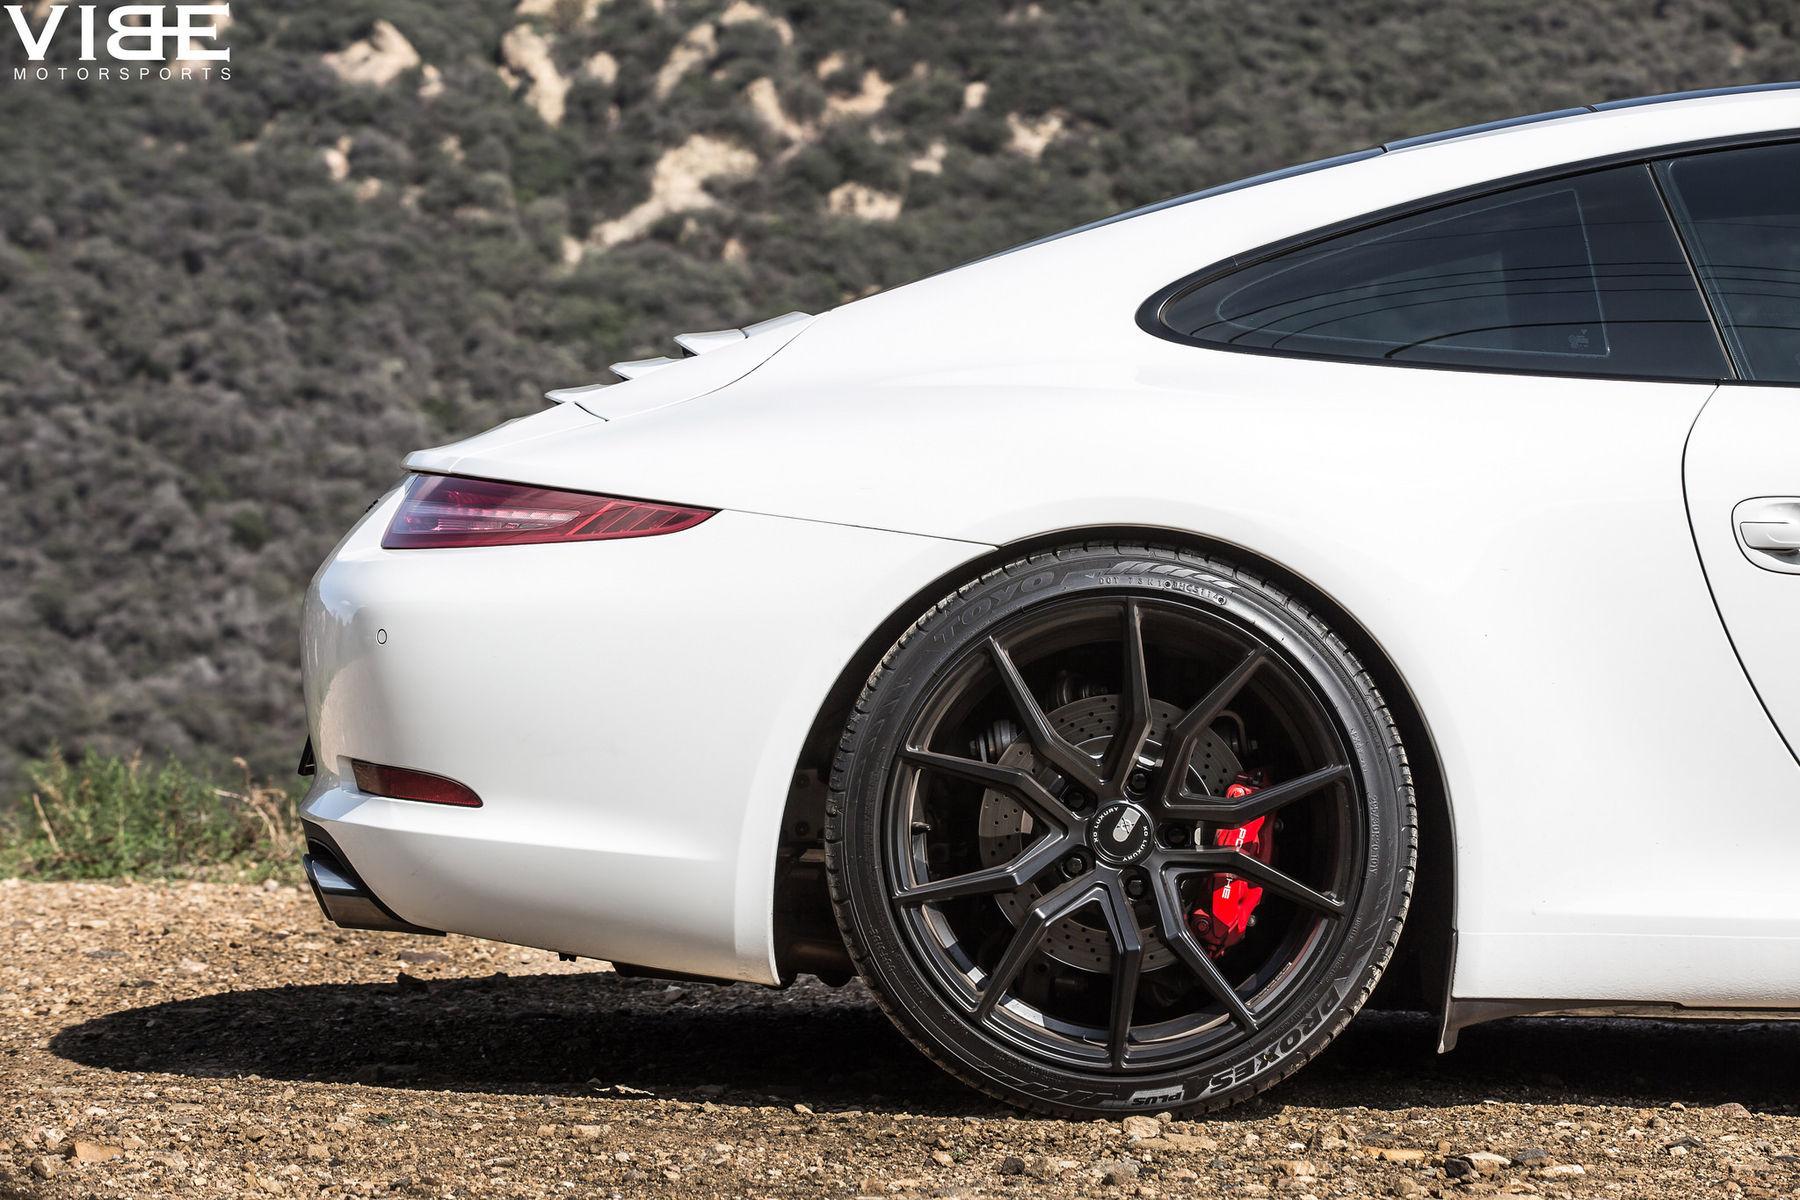 2014 Porsche 911 | Porsche 911 Carrera on 20